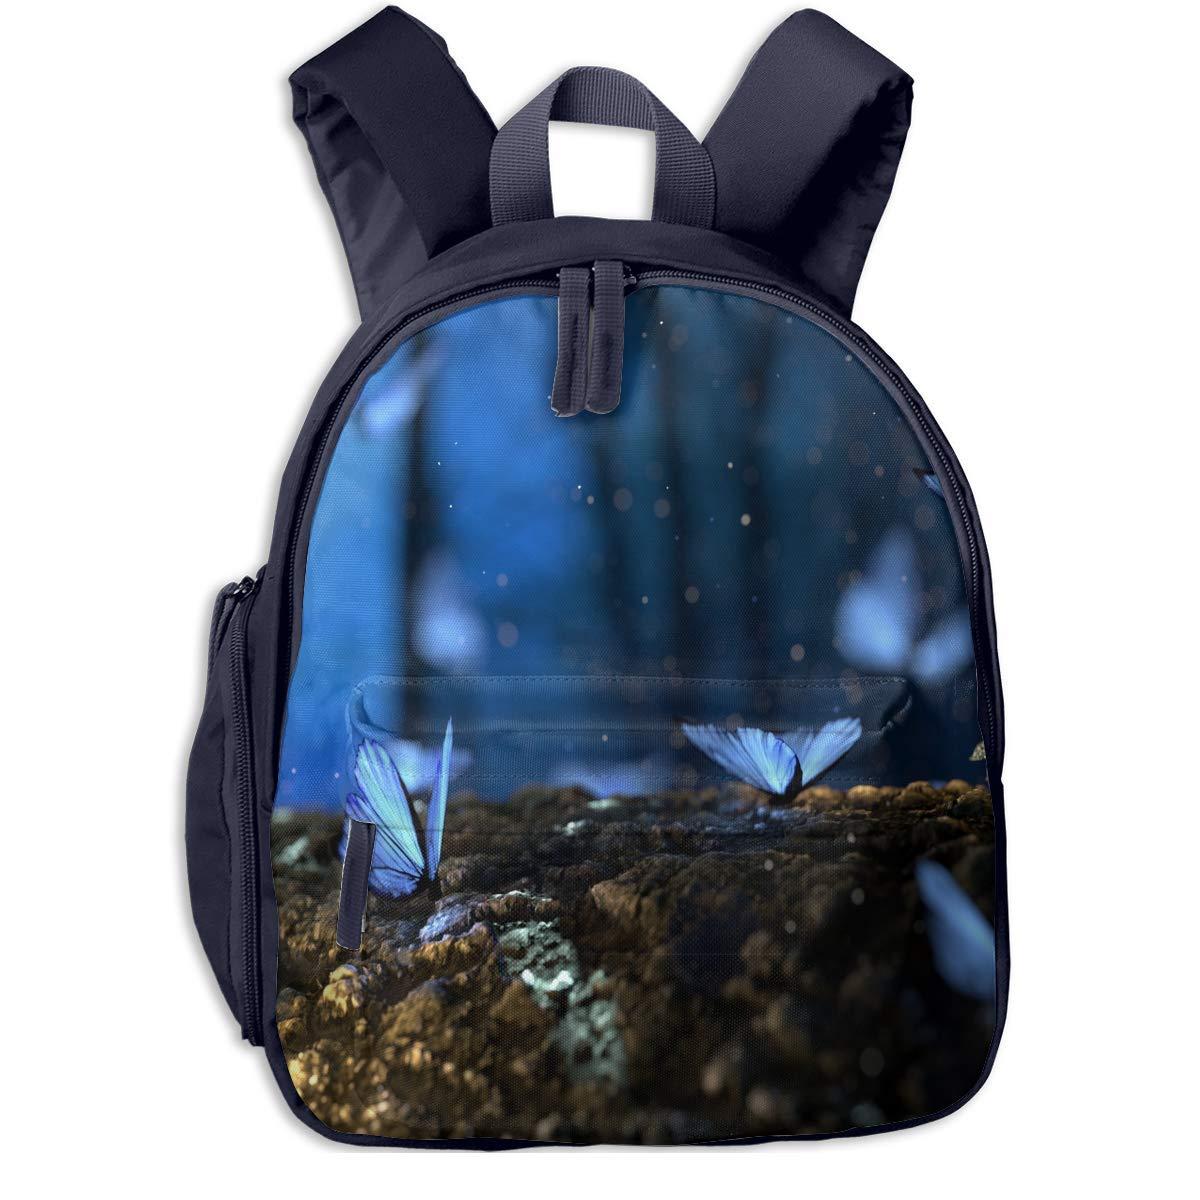 School Backpack for Girls Boys, Boys, Boys, Kids Cute Blau Beautful Butterfly Cartoon Backpacks Book Bag B07M9QZX4Z Daypacks Flut Schuhe Liste d449a0